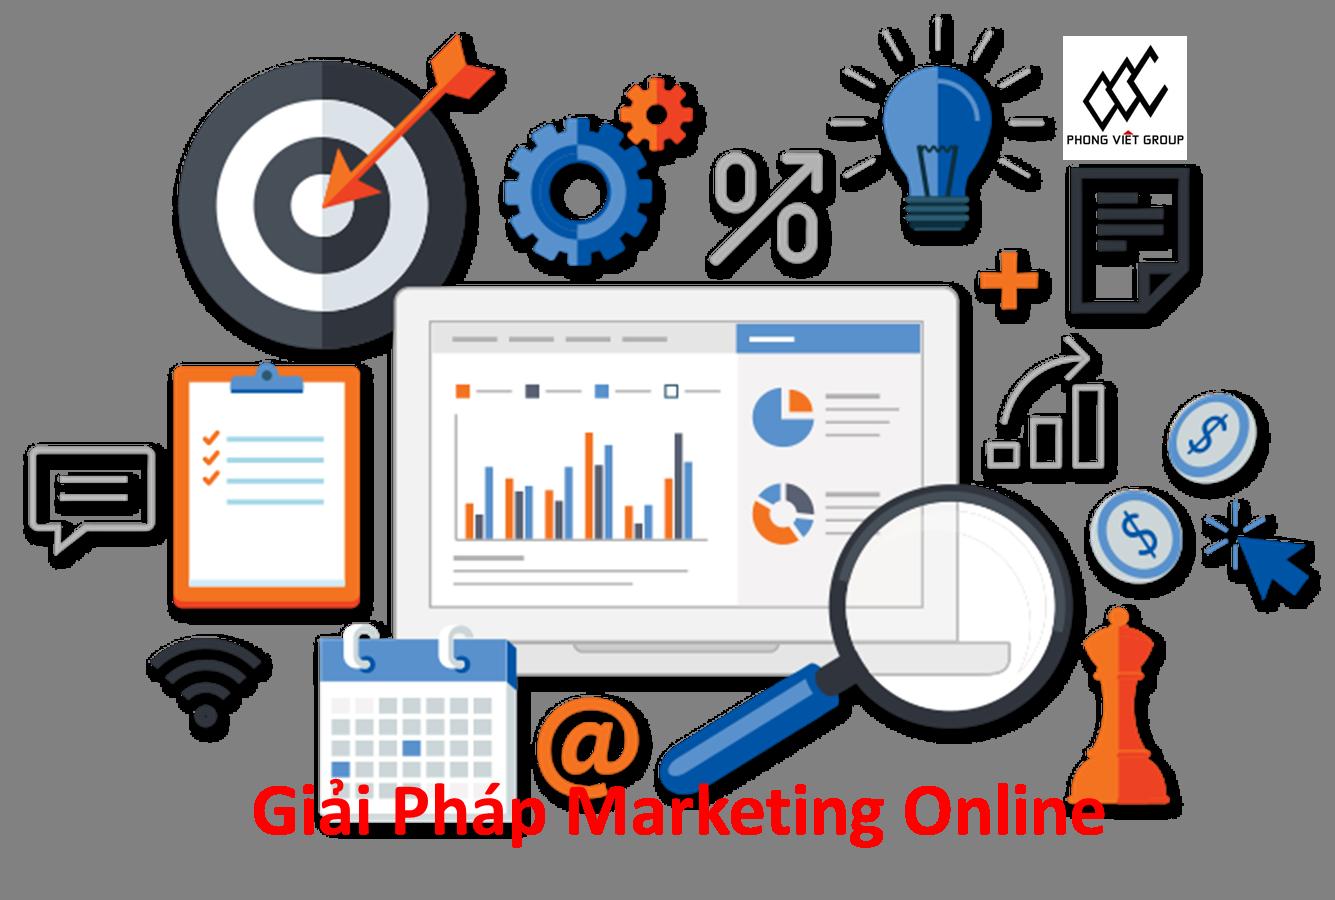 giải-pháp-marketing-online